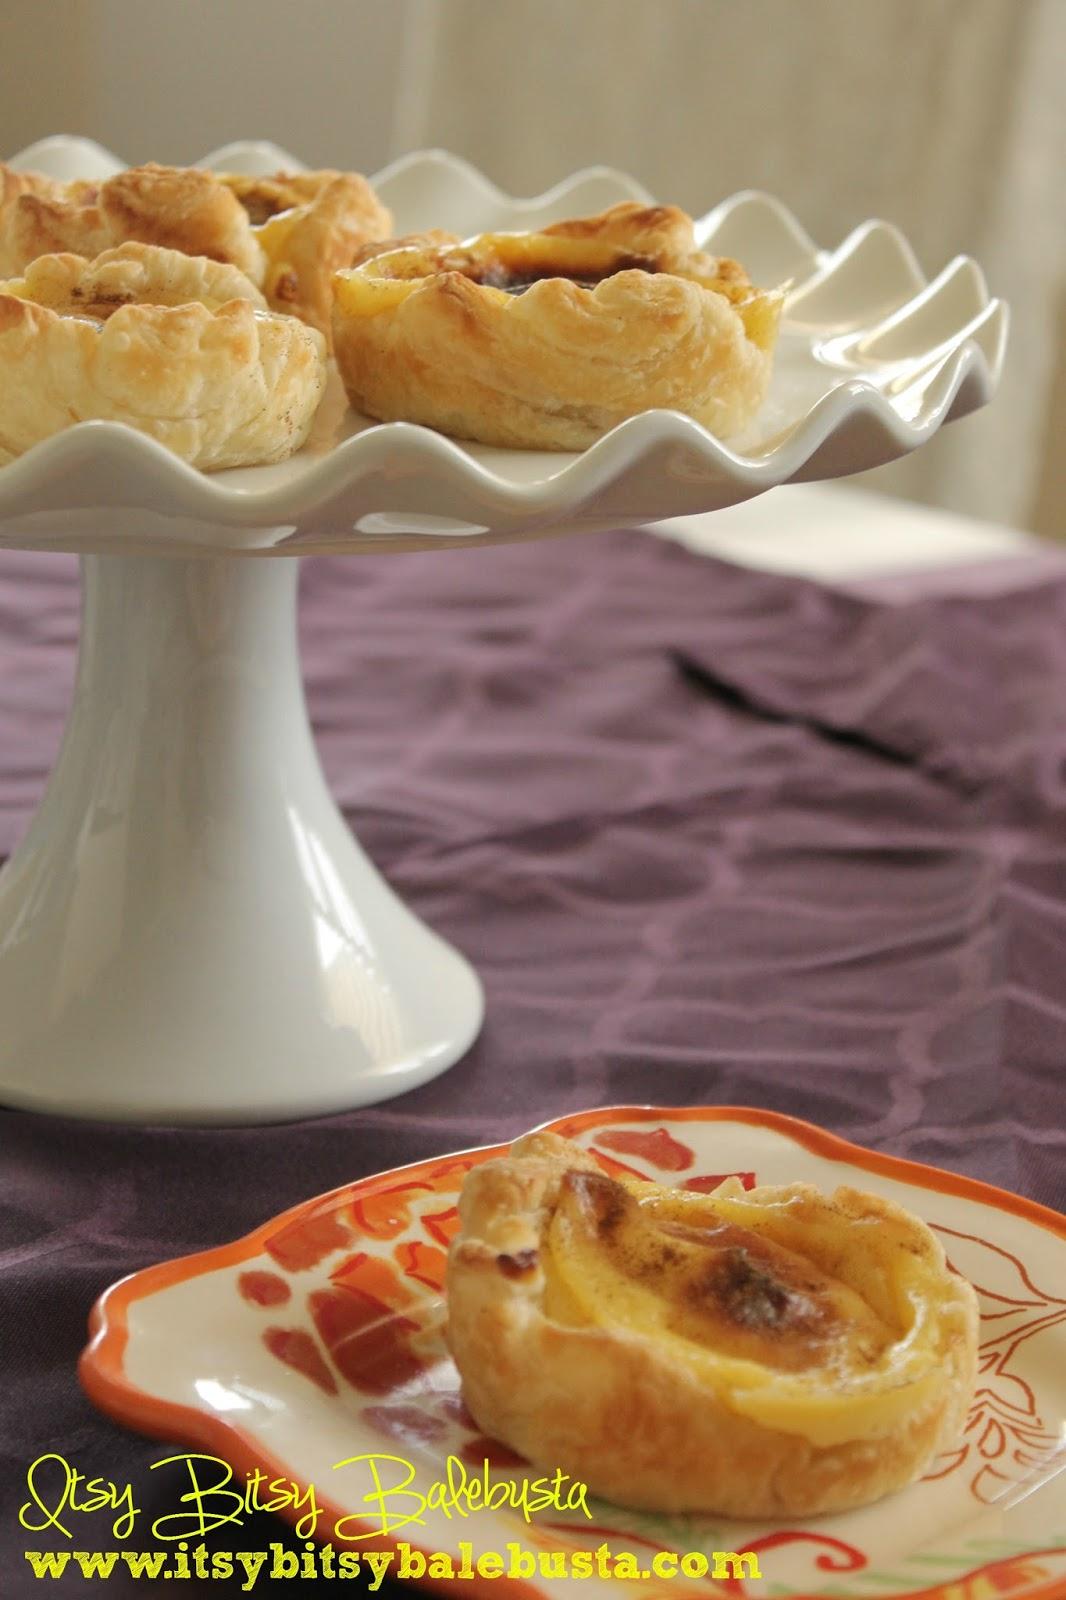 Itsy bitsy balebusta pasteis de nata ricardo cuisine for Cuisine ricardo